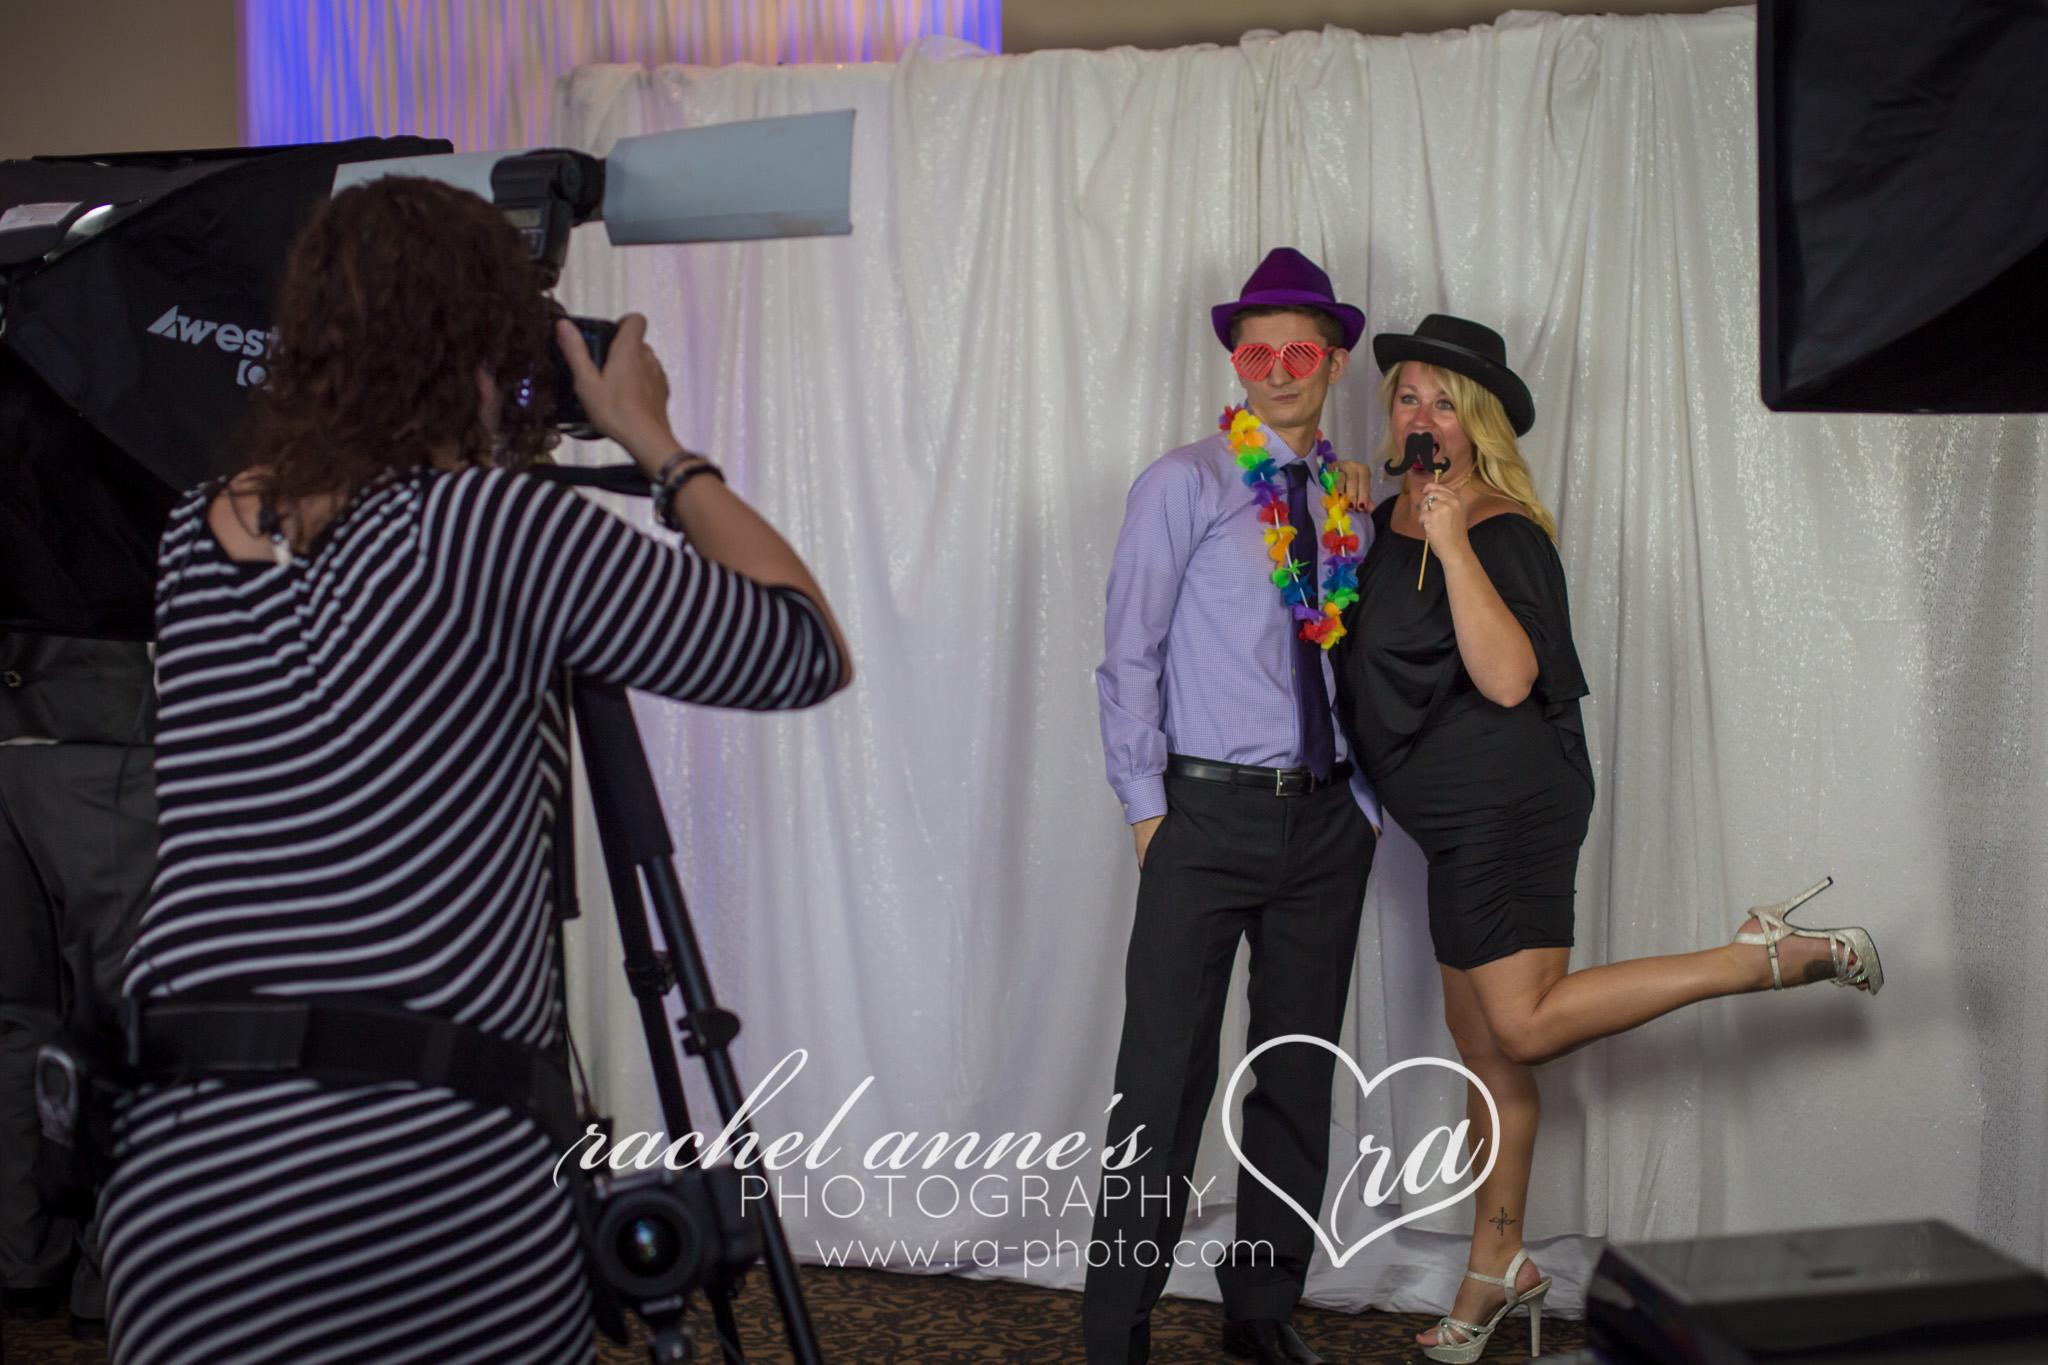 077-JCM-OLD-ECONOMY-VILLAGE-THE-FEZ-PA-WEDDINGS.jpg